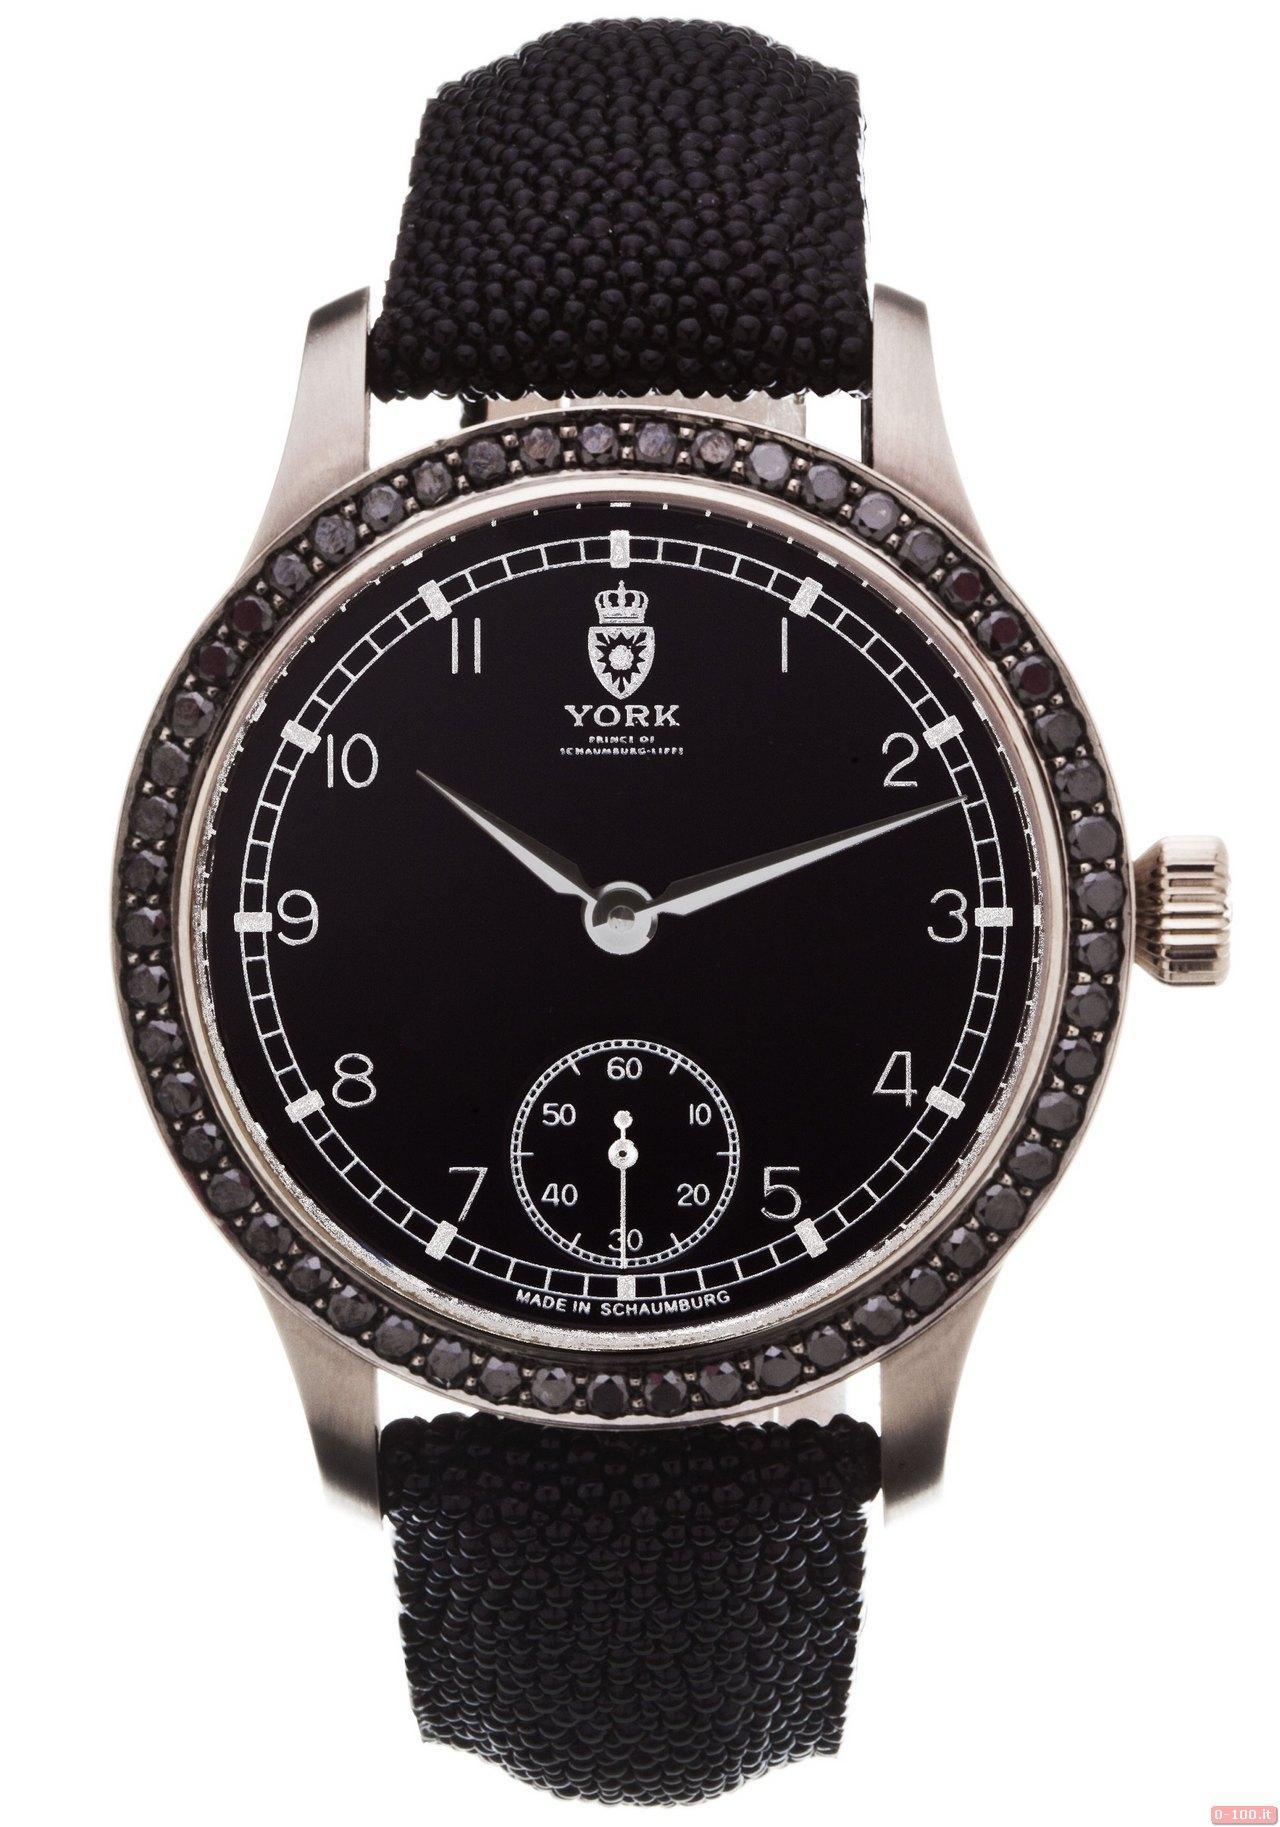 anteprima-baselworld-2013-york-royal-black-caviar_0-100 1